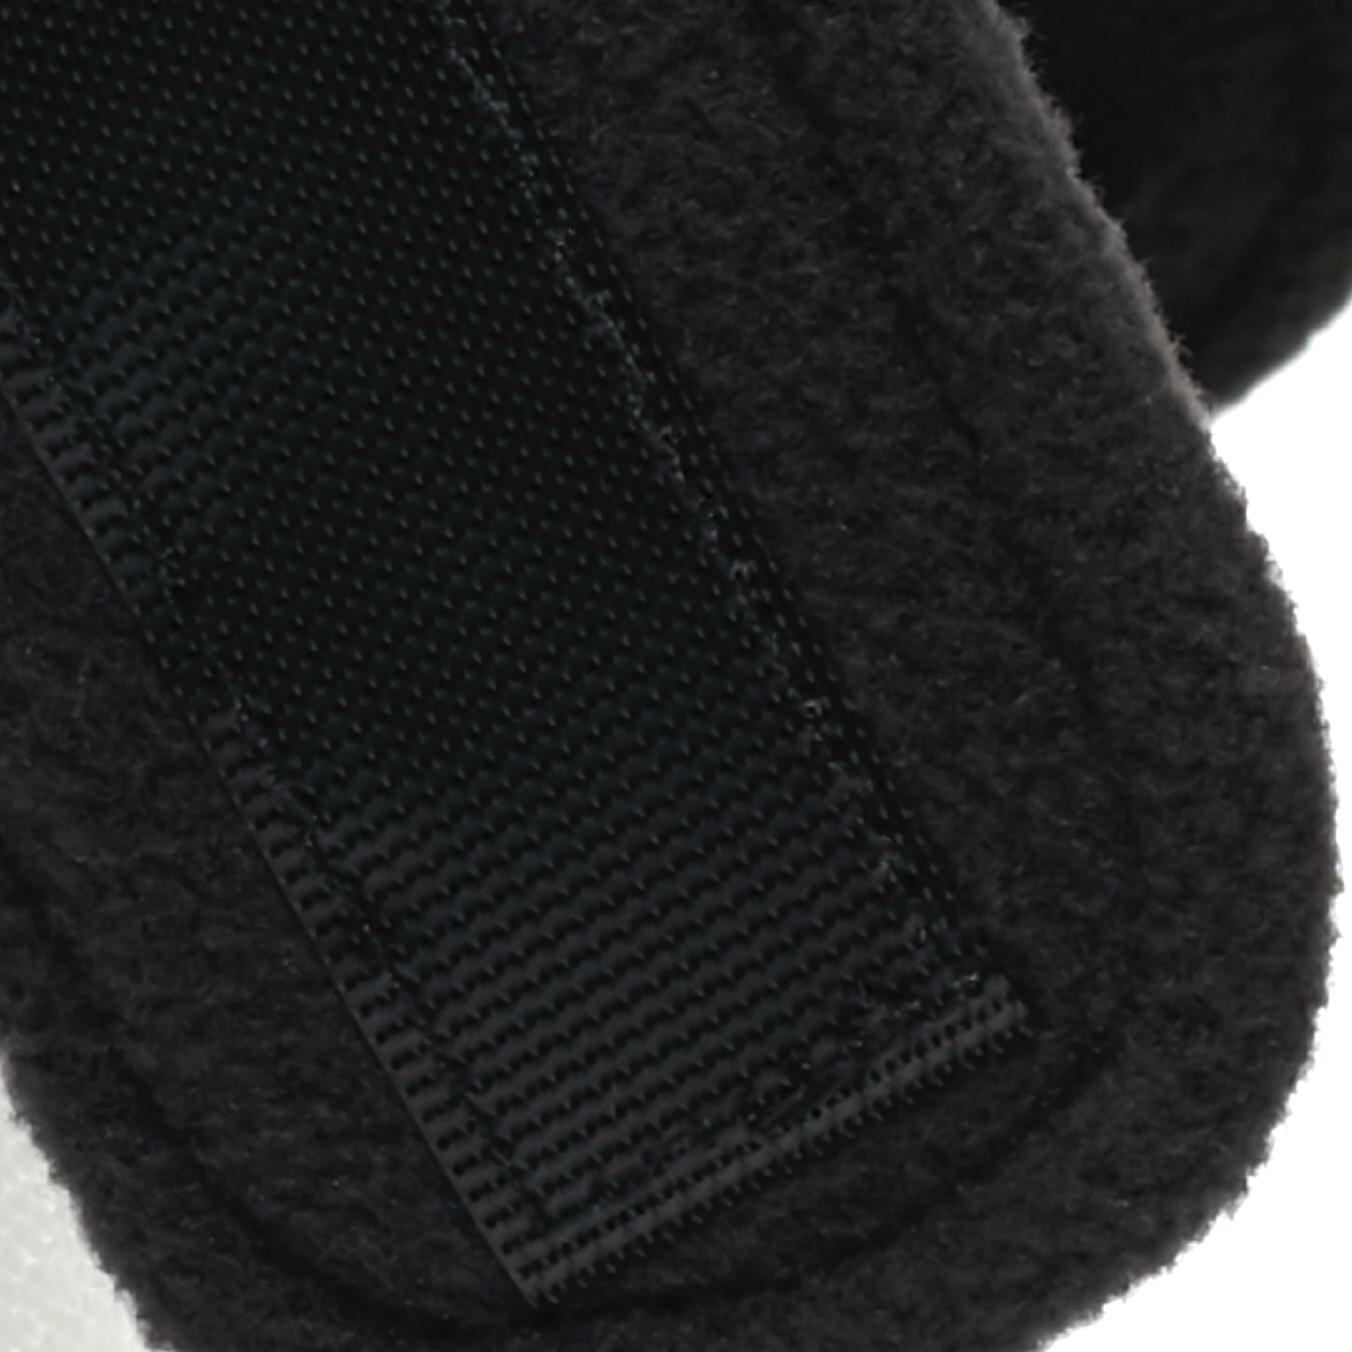 3c0b6f4e6d5 Nike SK H86 Cap Earflap QS - Ao8234-010 - Sneakersnstuff